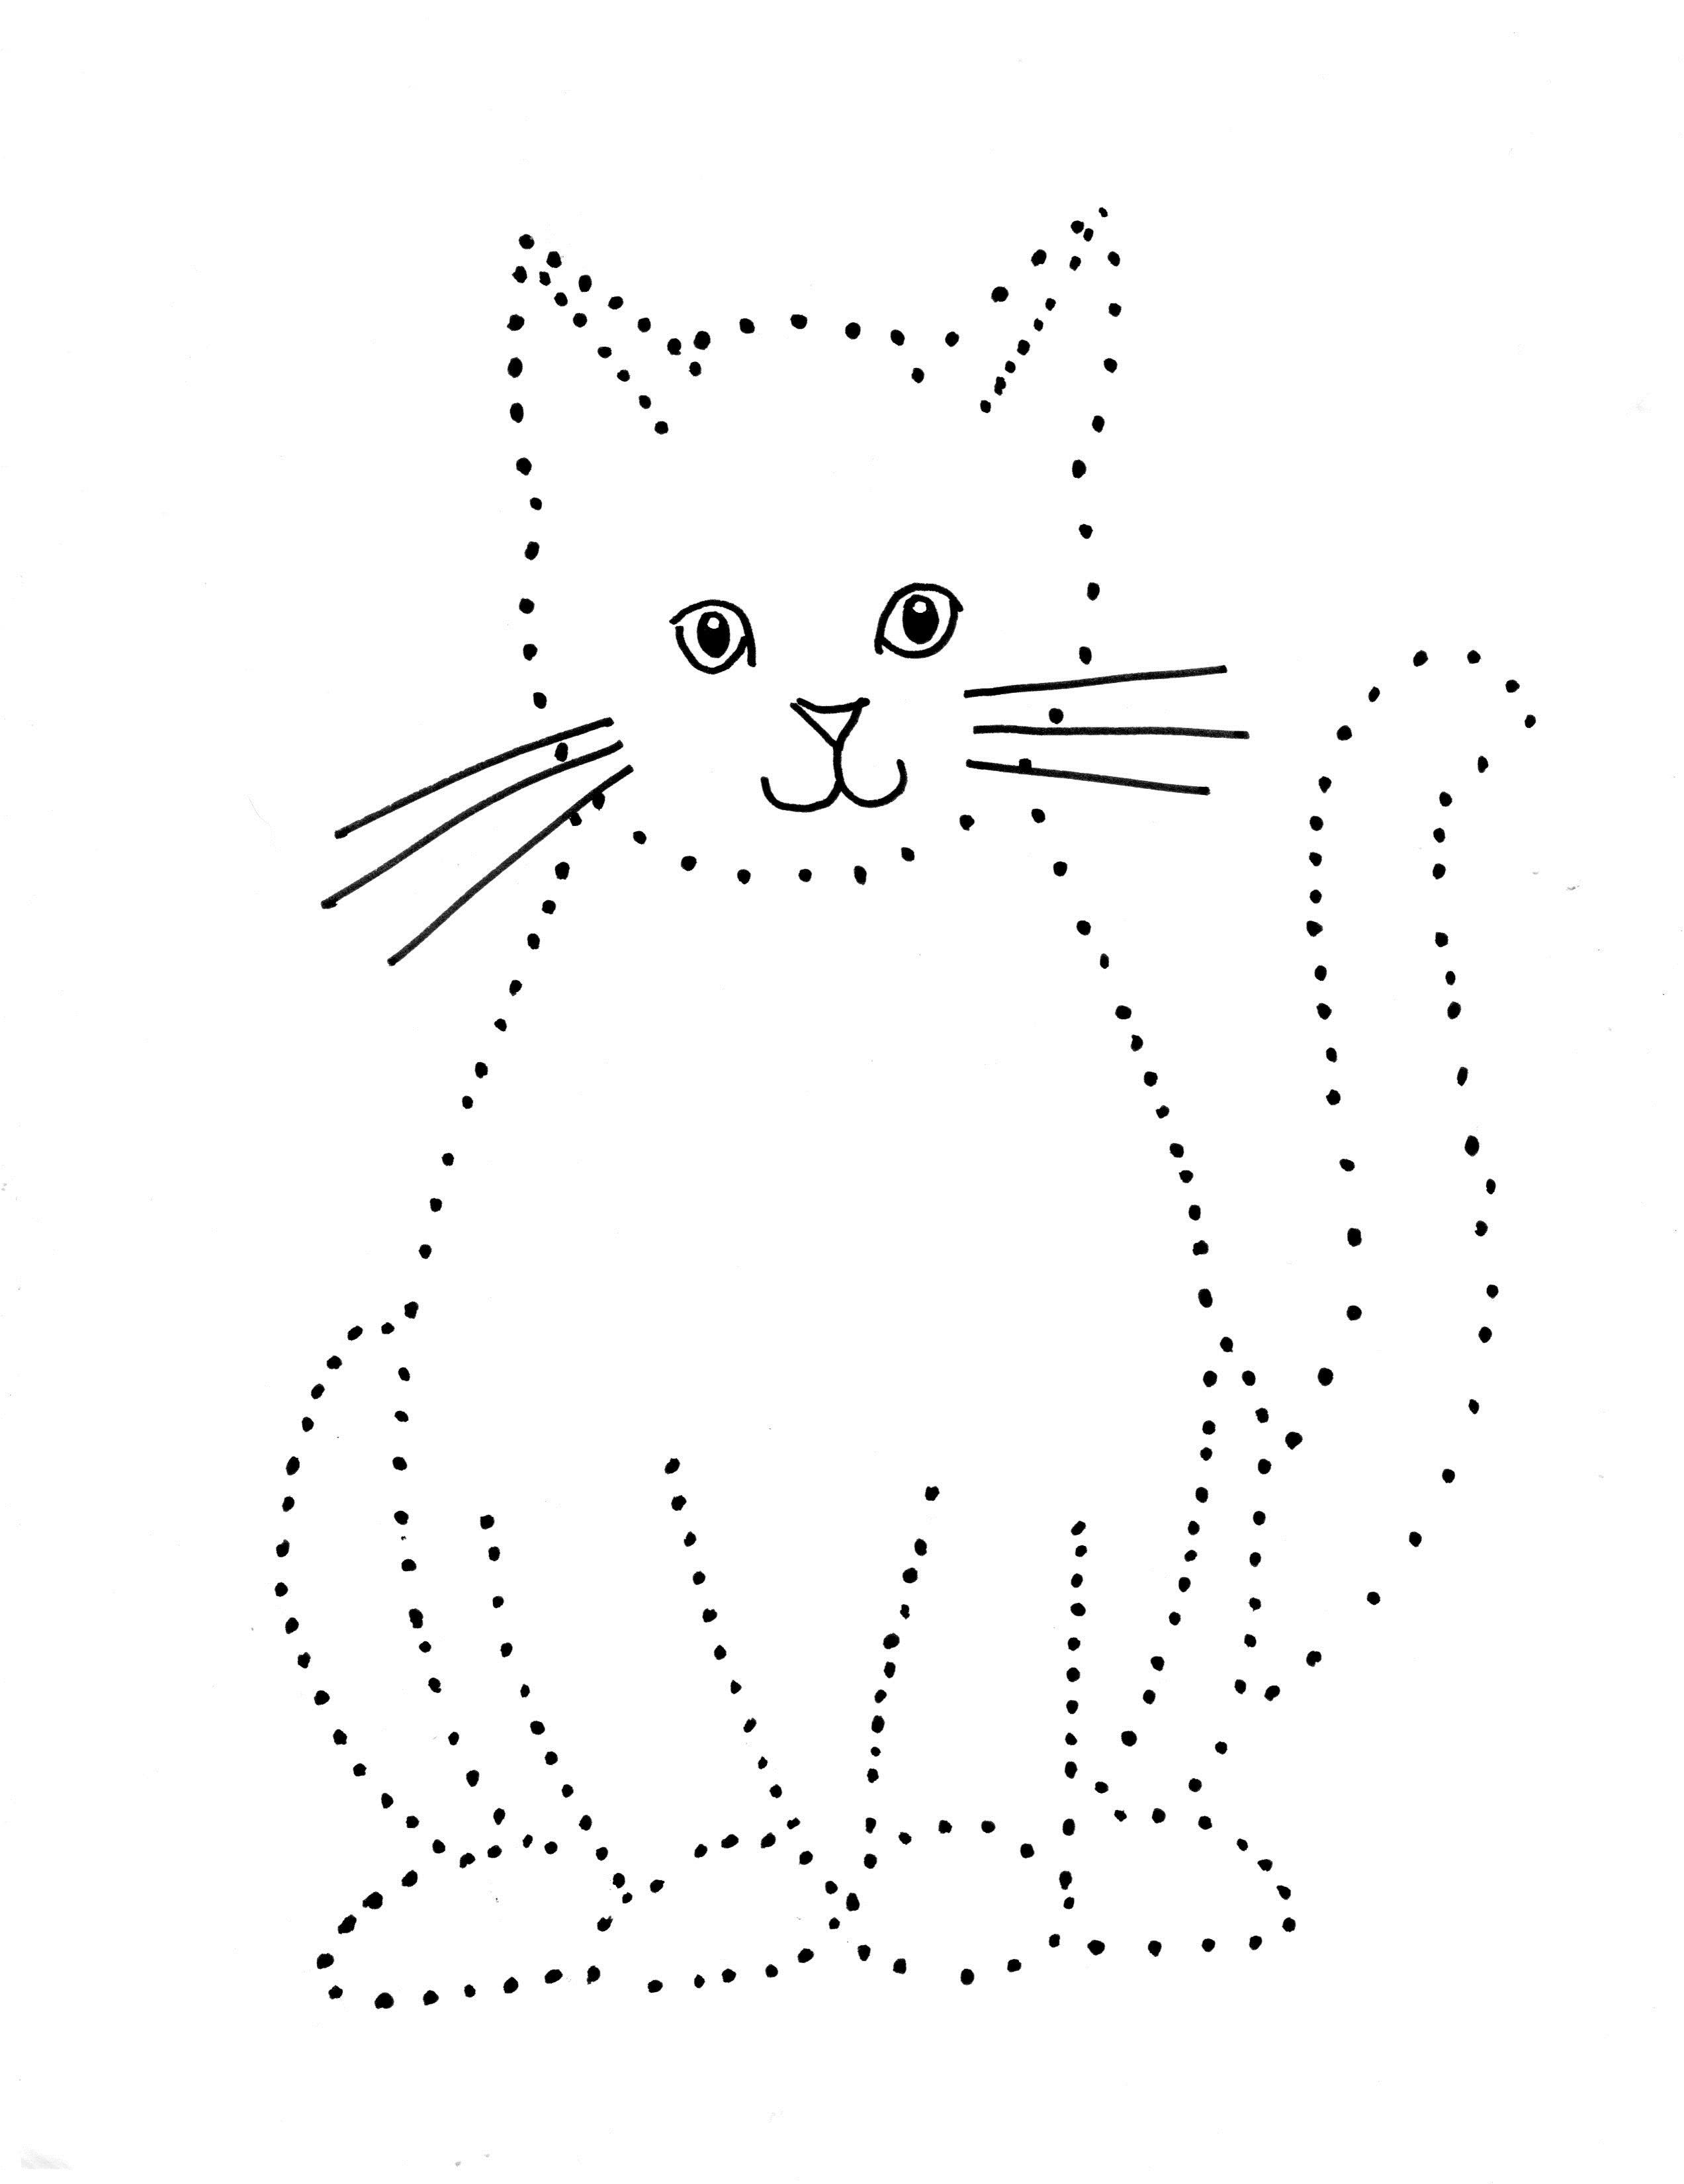 Cat Dot Drawing Samantha Bell